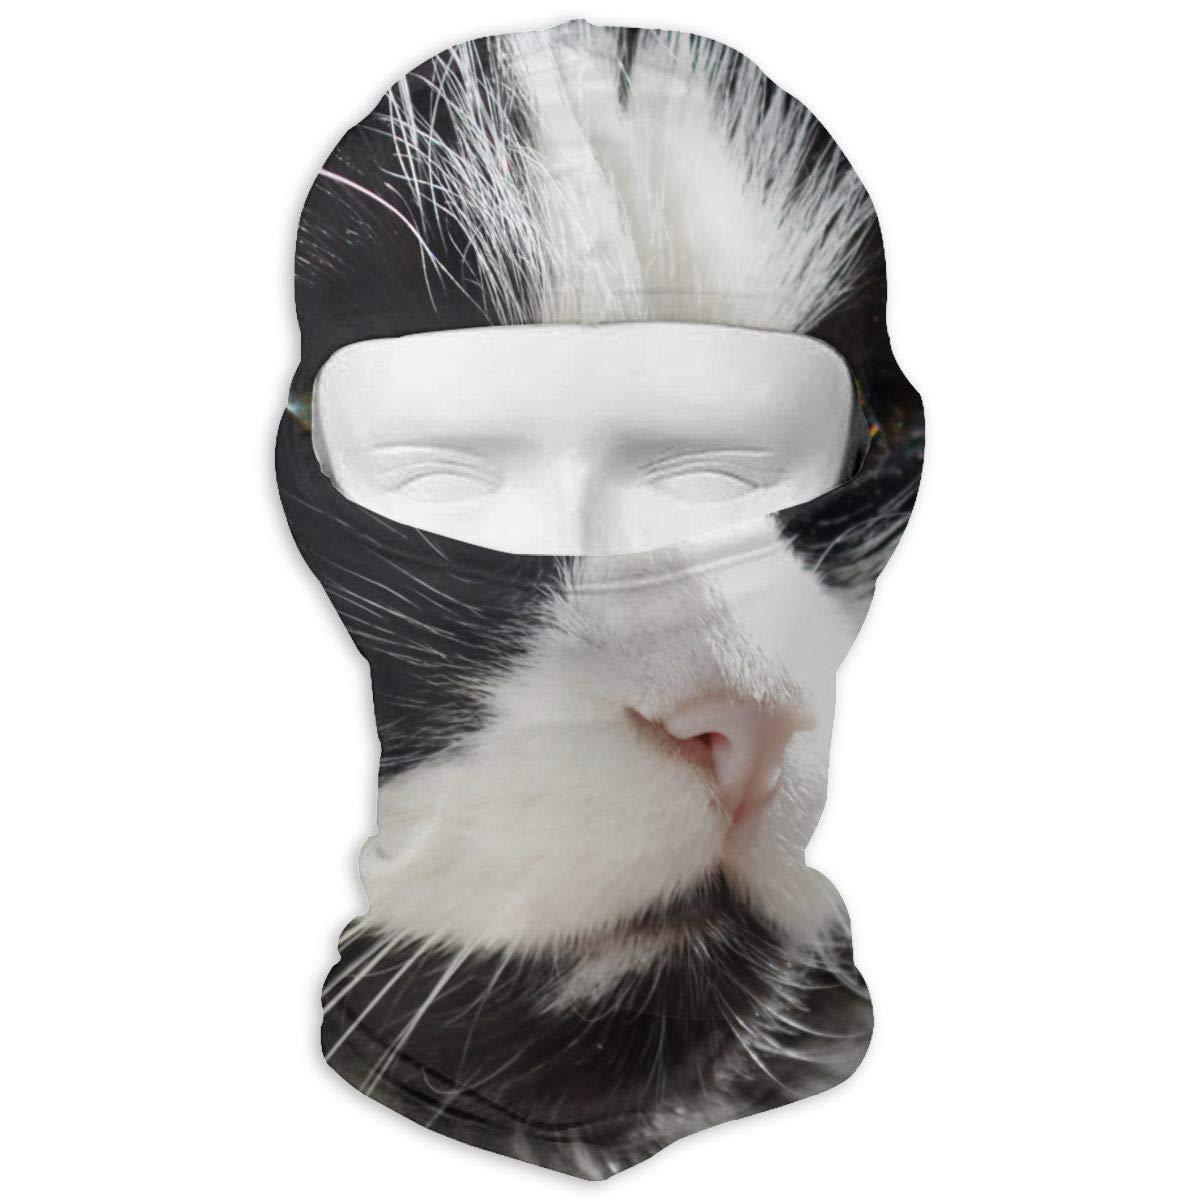 Nifdhkw Upset Cat Ski Motorcycle Balaclava Mask Sunscreen Hat Windproof Cap Multicolor4